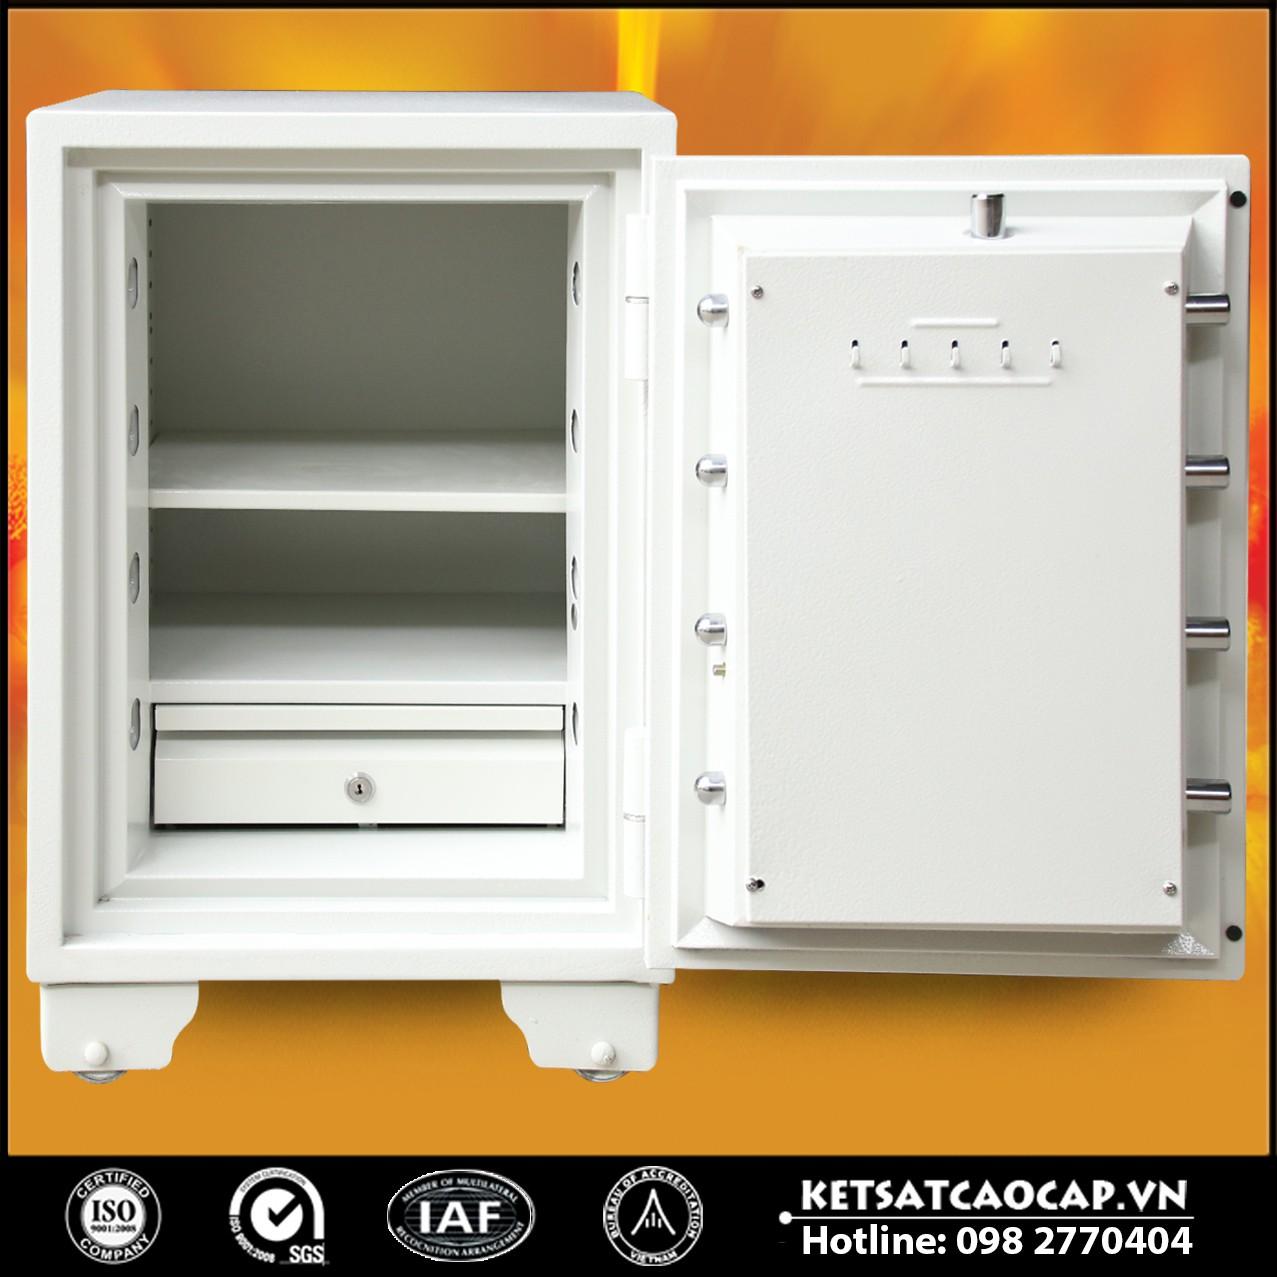 Mua Két Sắt LX700 White - KC